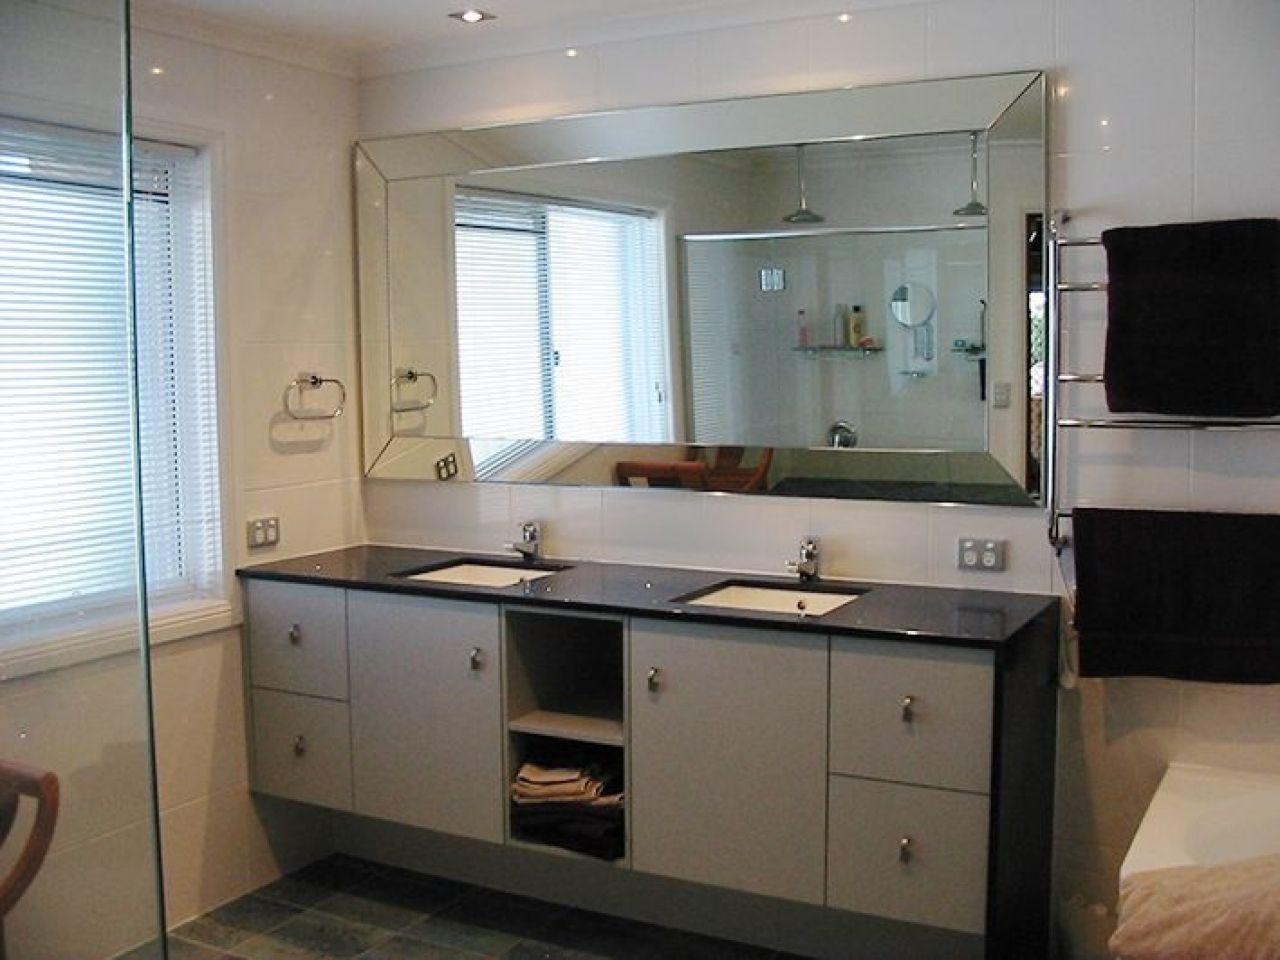 21 Bathroom Mirror Ideas To Inspire Your Home Refresh  Bathroom Endearing Large Bathroom Vanity Mirrors Inspiration Design